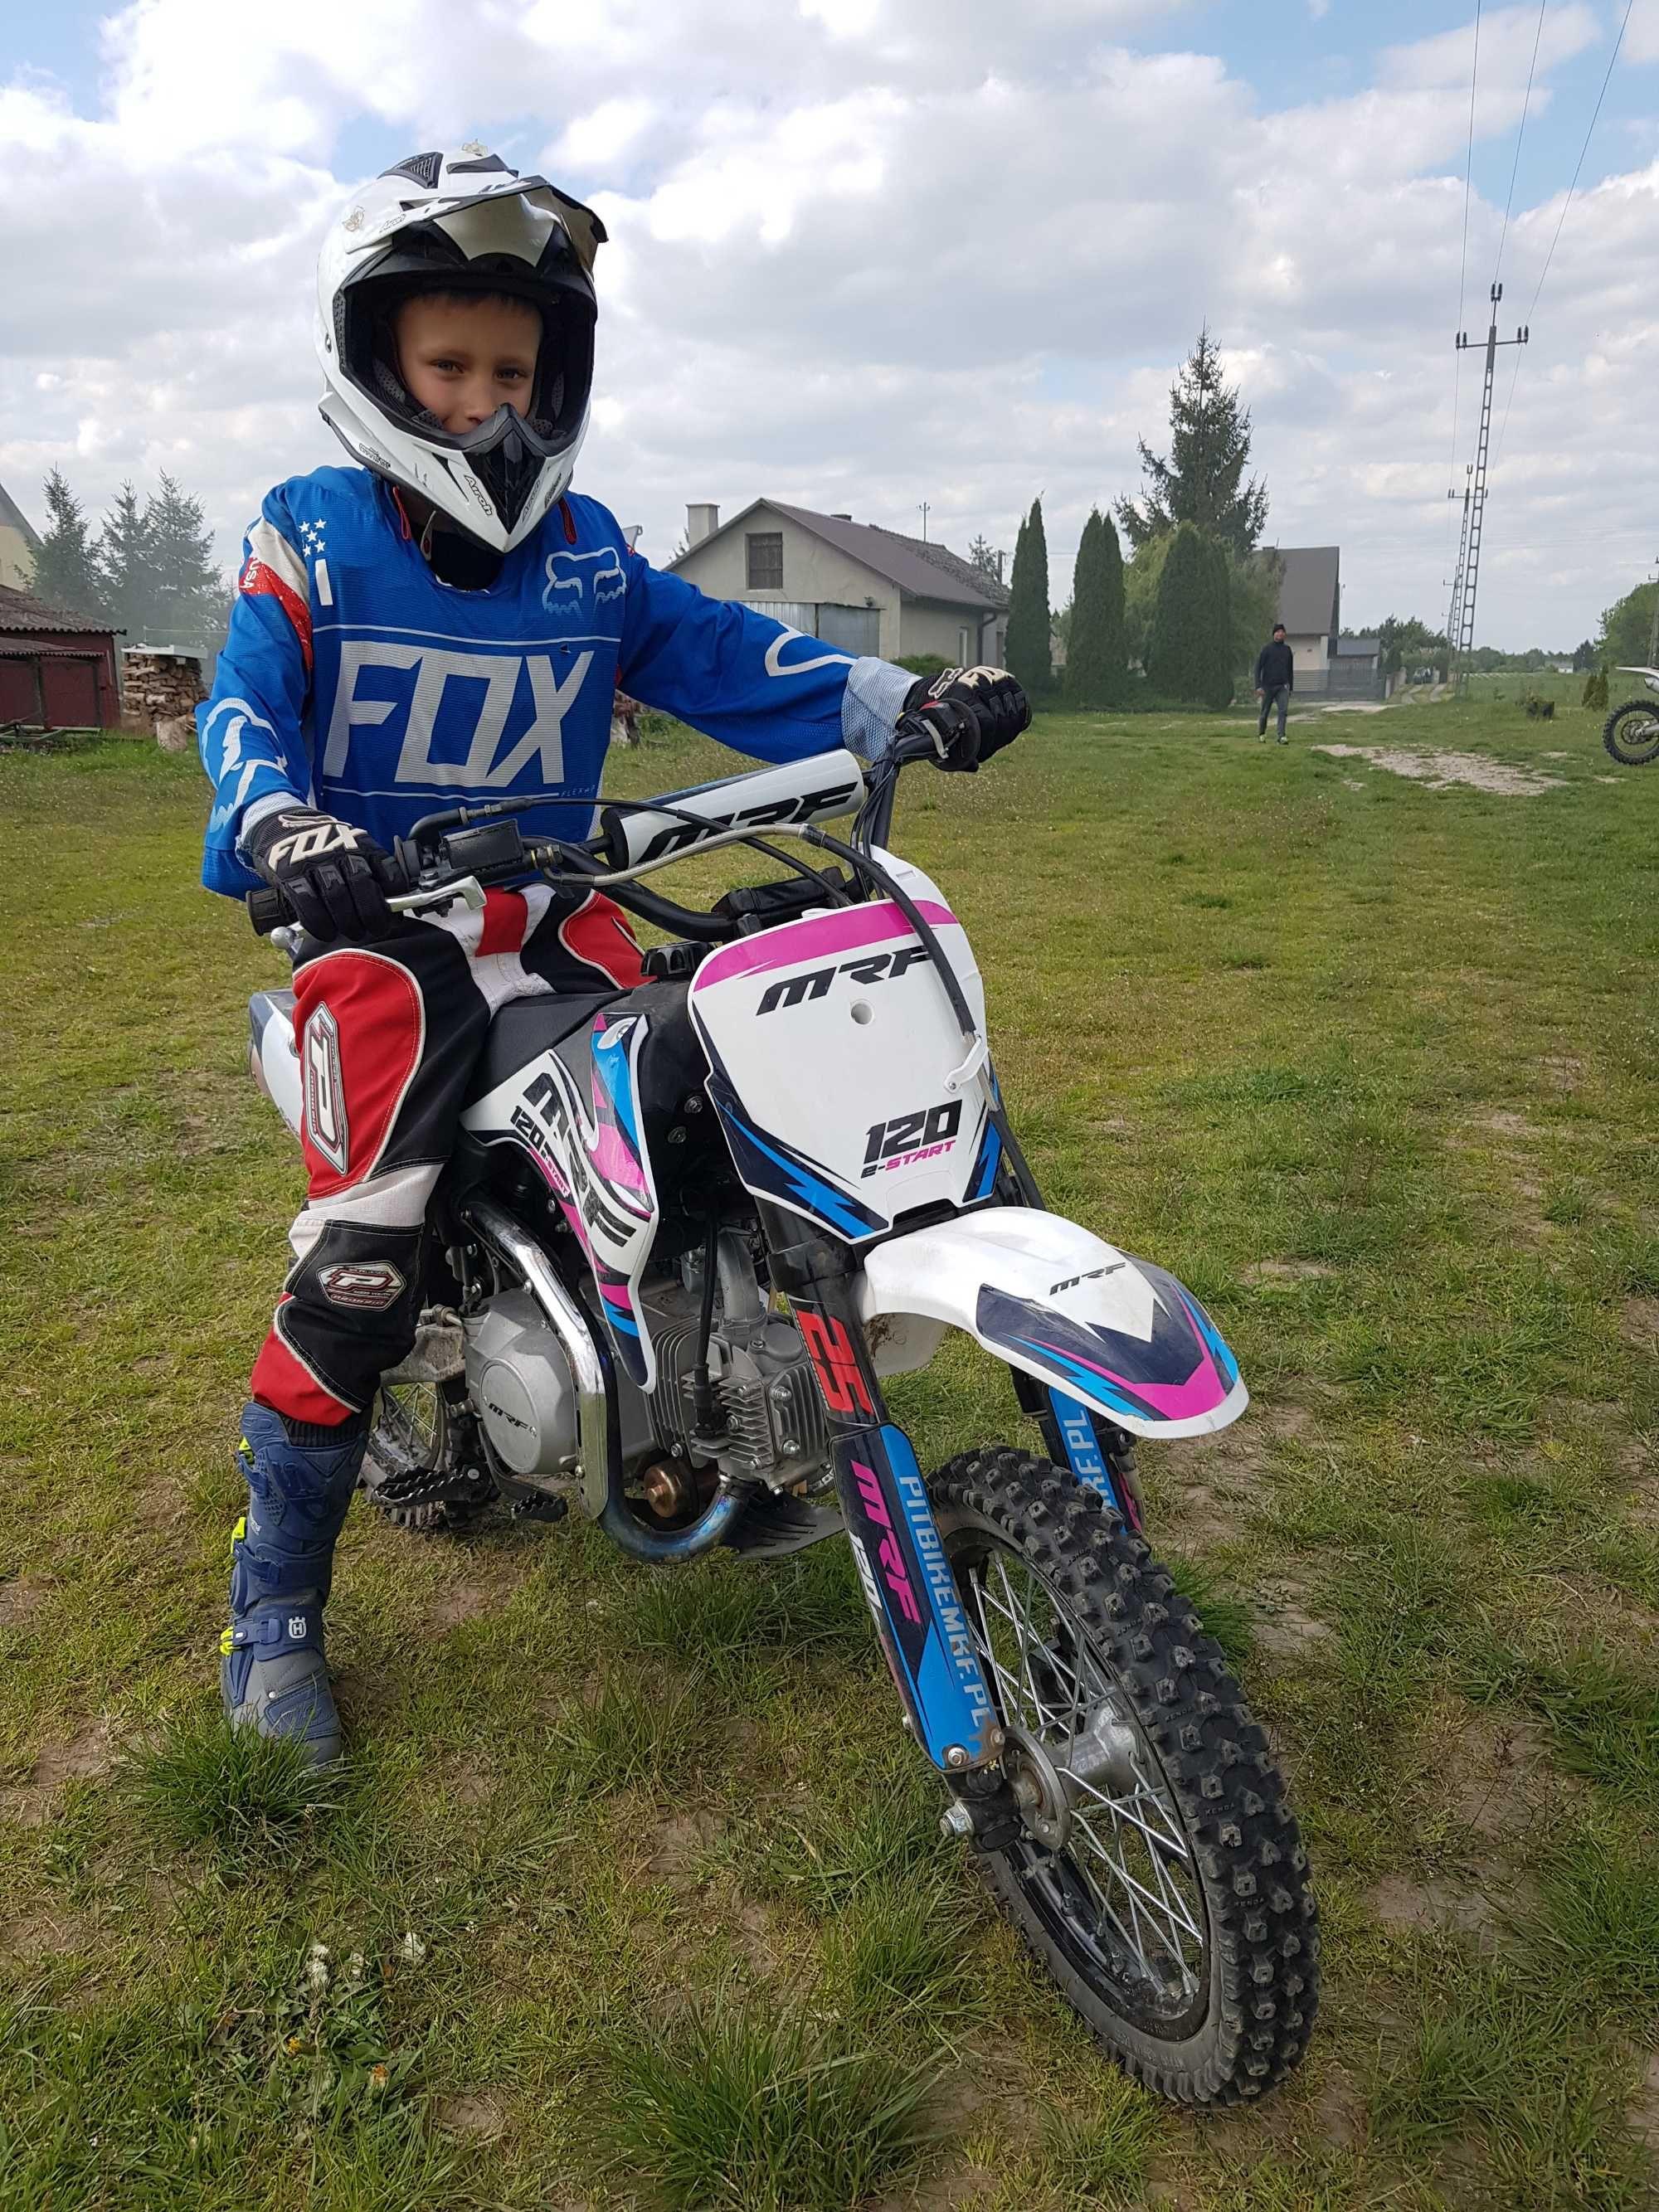 MRF 120 Pitbike / motocross